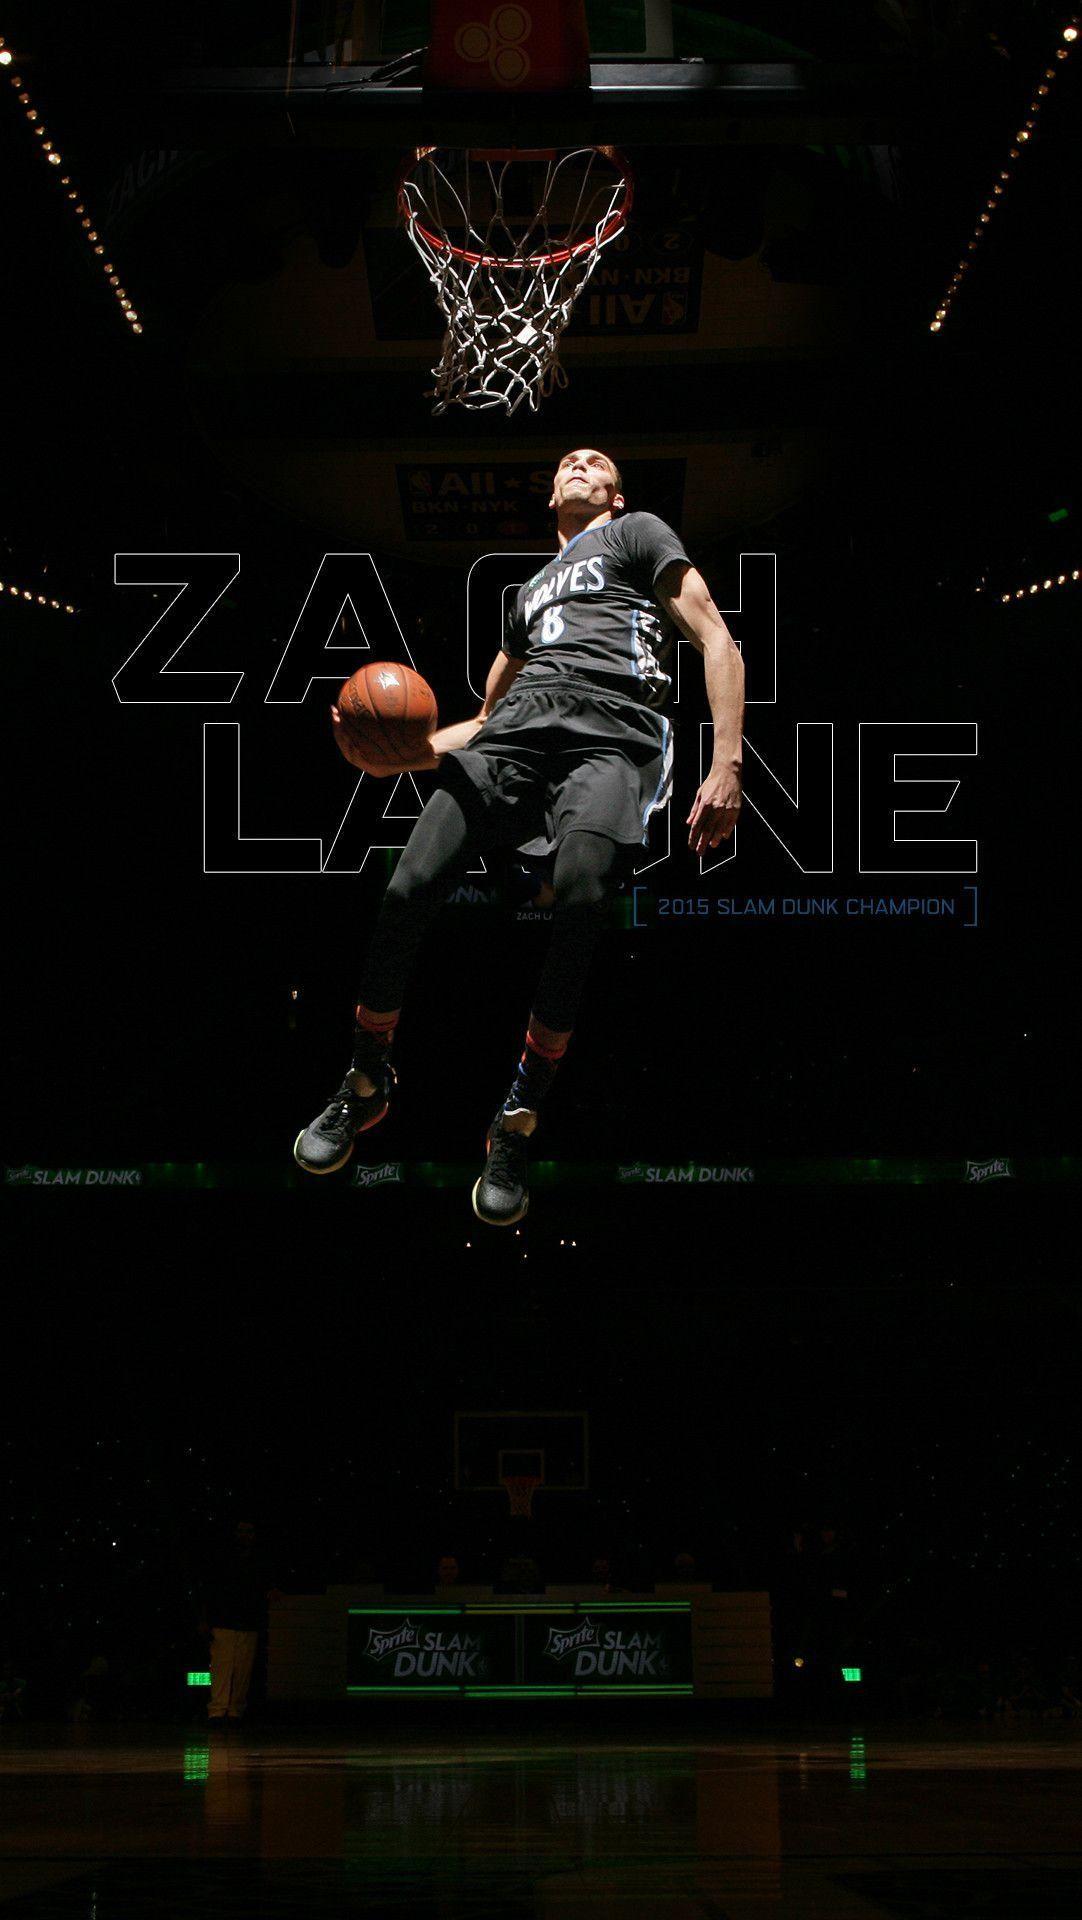 Zach Lavine Wallpaper Nba Wallpapers Iphone Wallpaper Nba Blazers Basketball